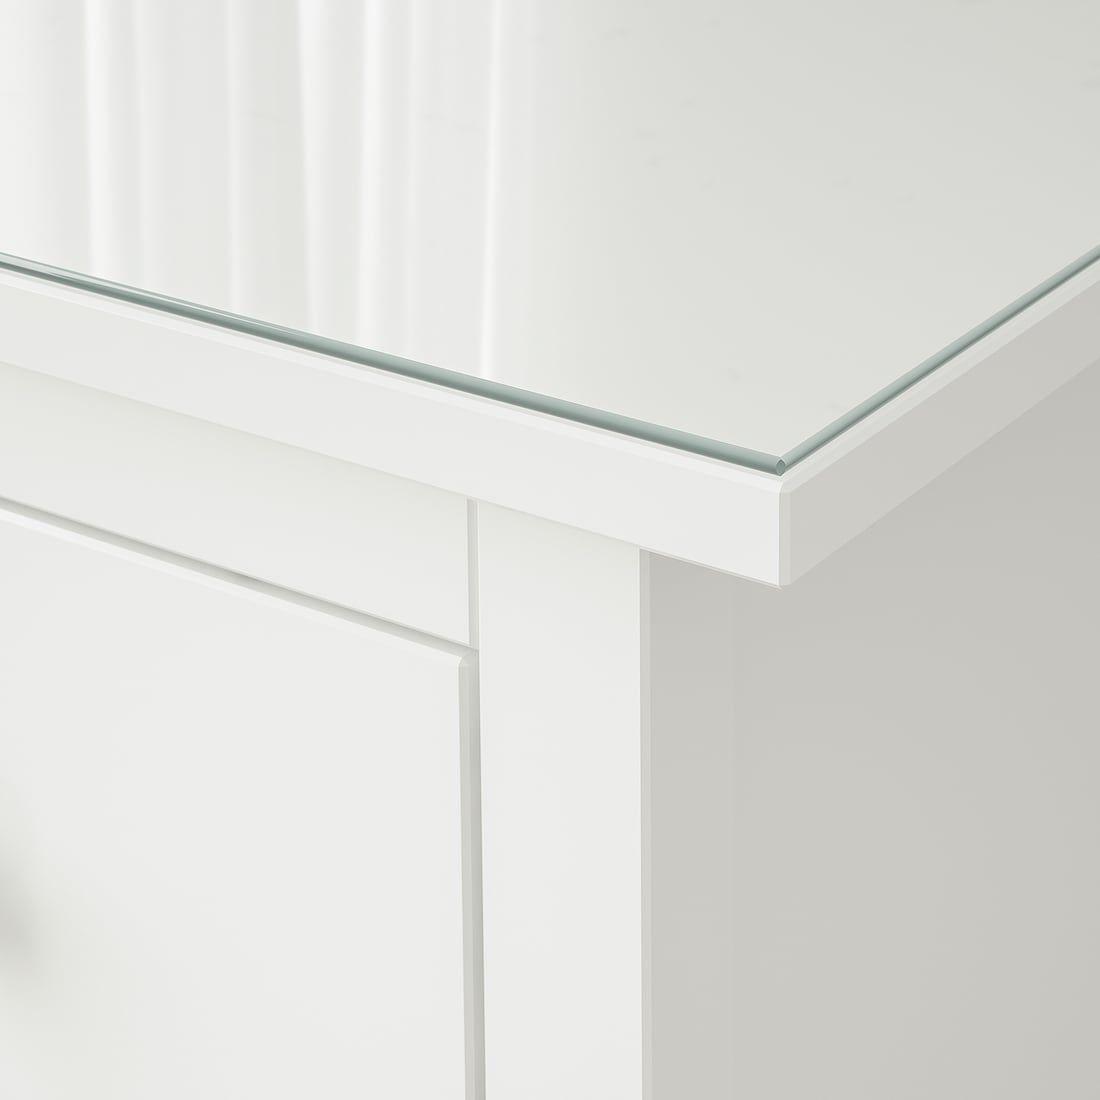 Hemnes Glass Top Transparent 62 5 8x19 5 8 Hemnes Glass Top